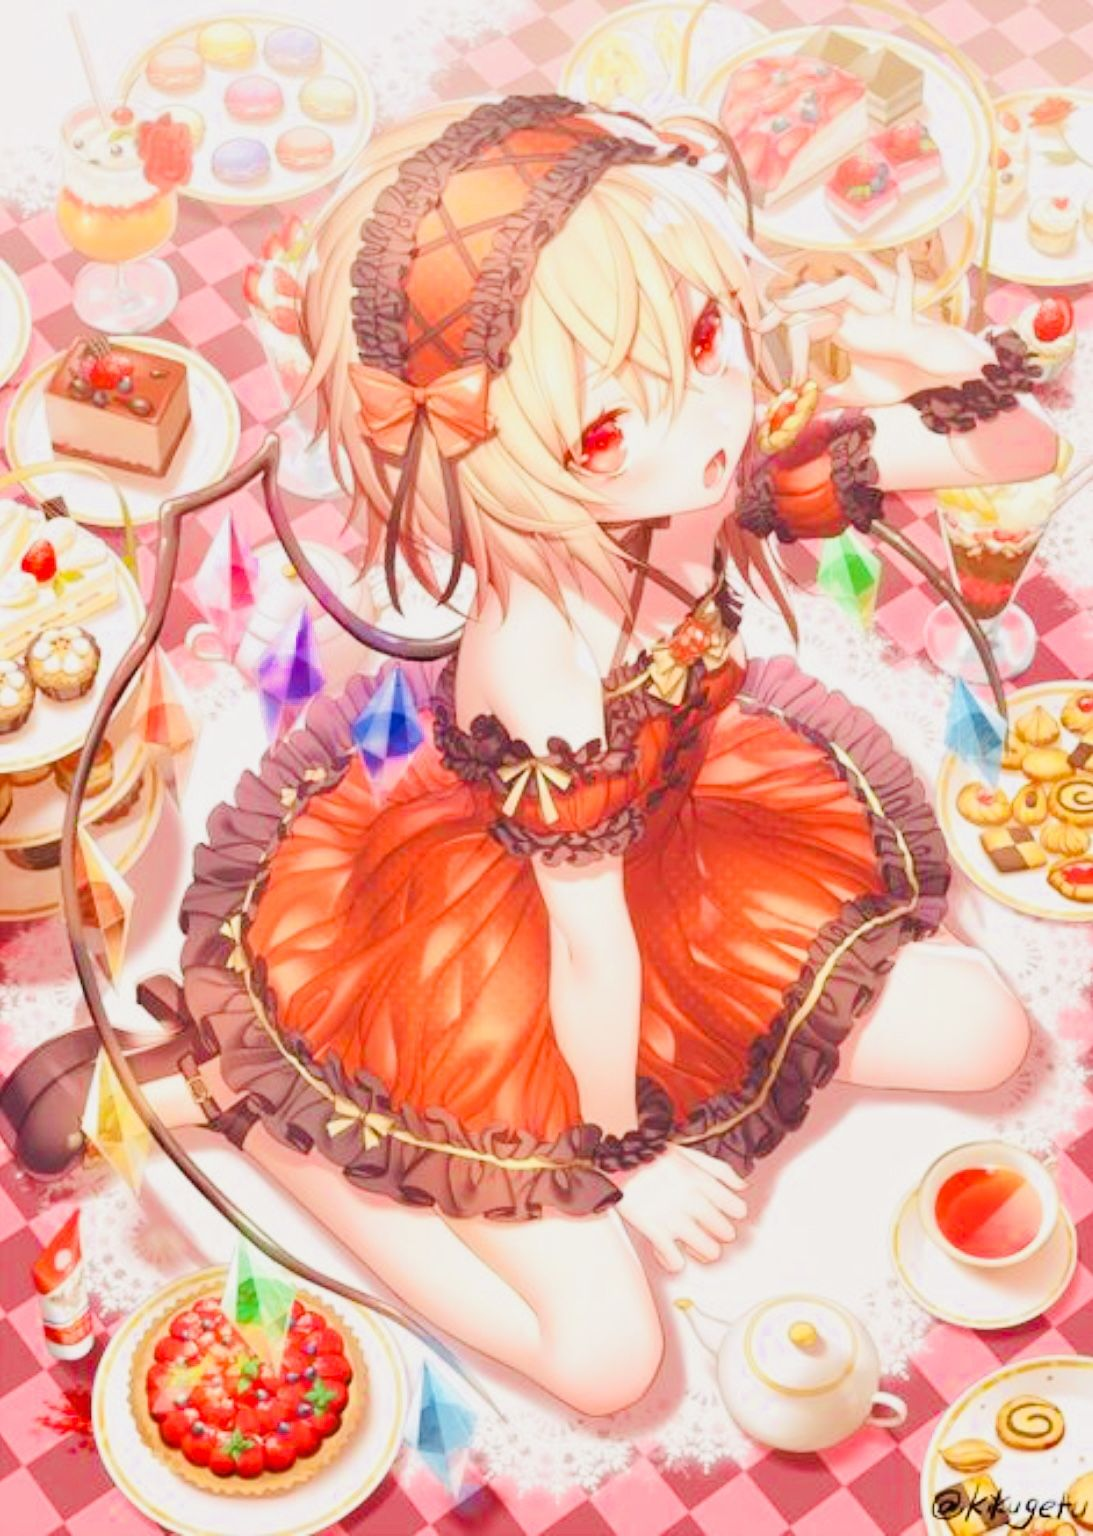 「Anime art and Etc!」おしゃれまとめの人気アイデア|Pinterest|Kawaii Girl